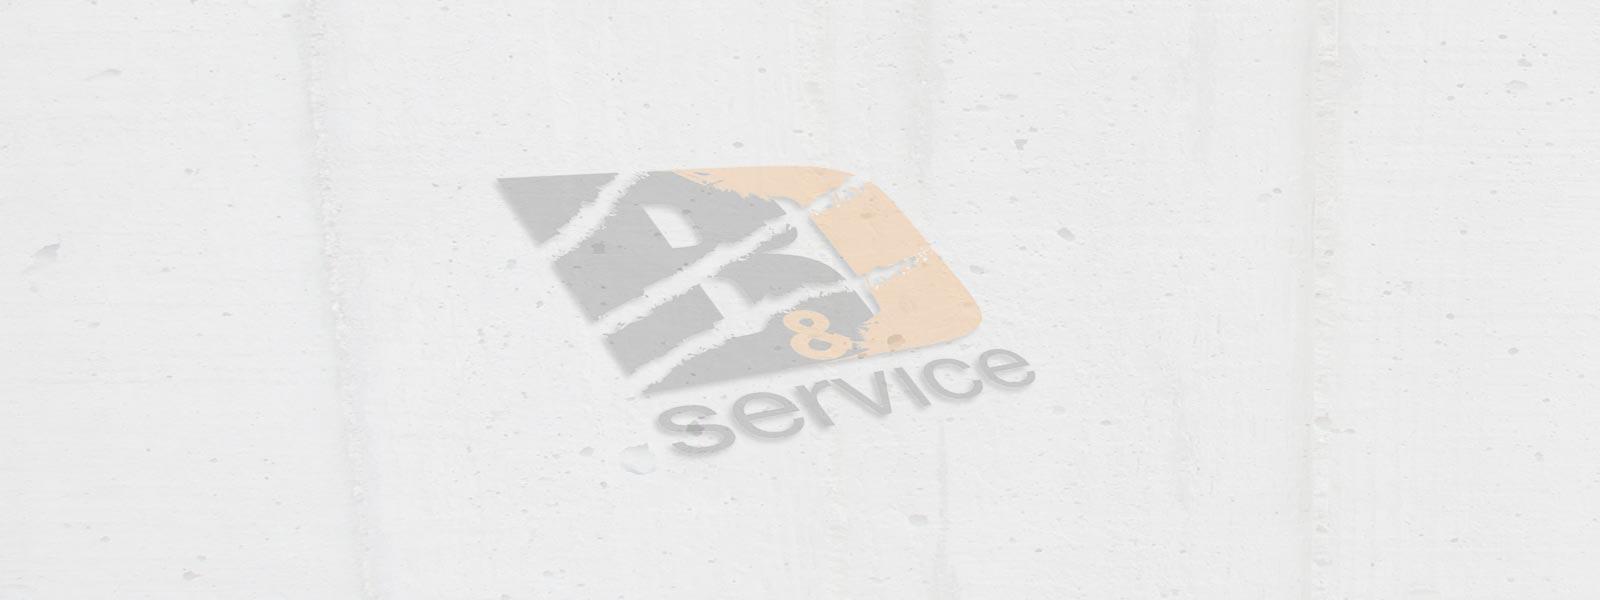 carrelli elevatori bd service lugano